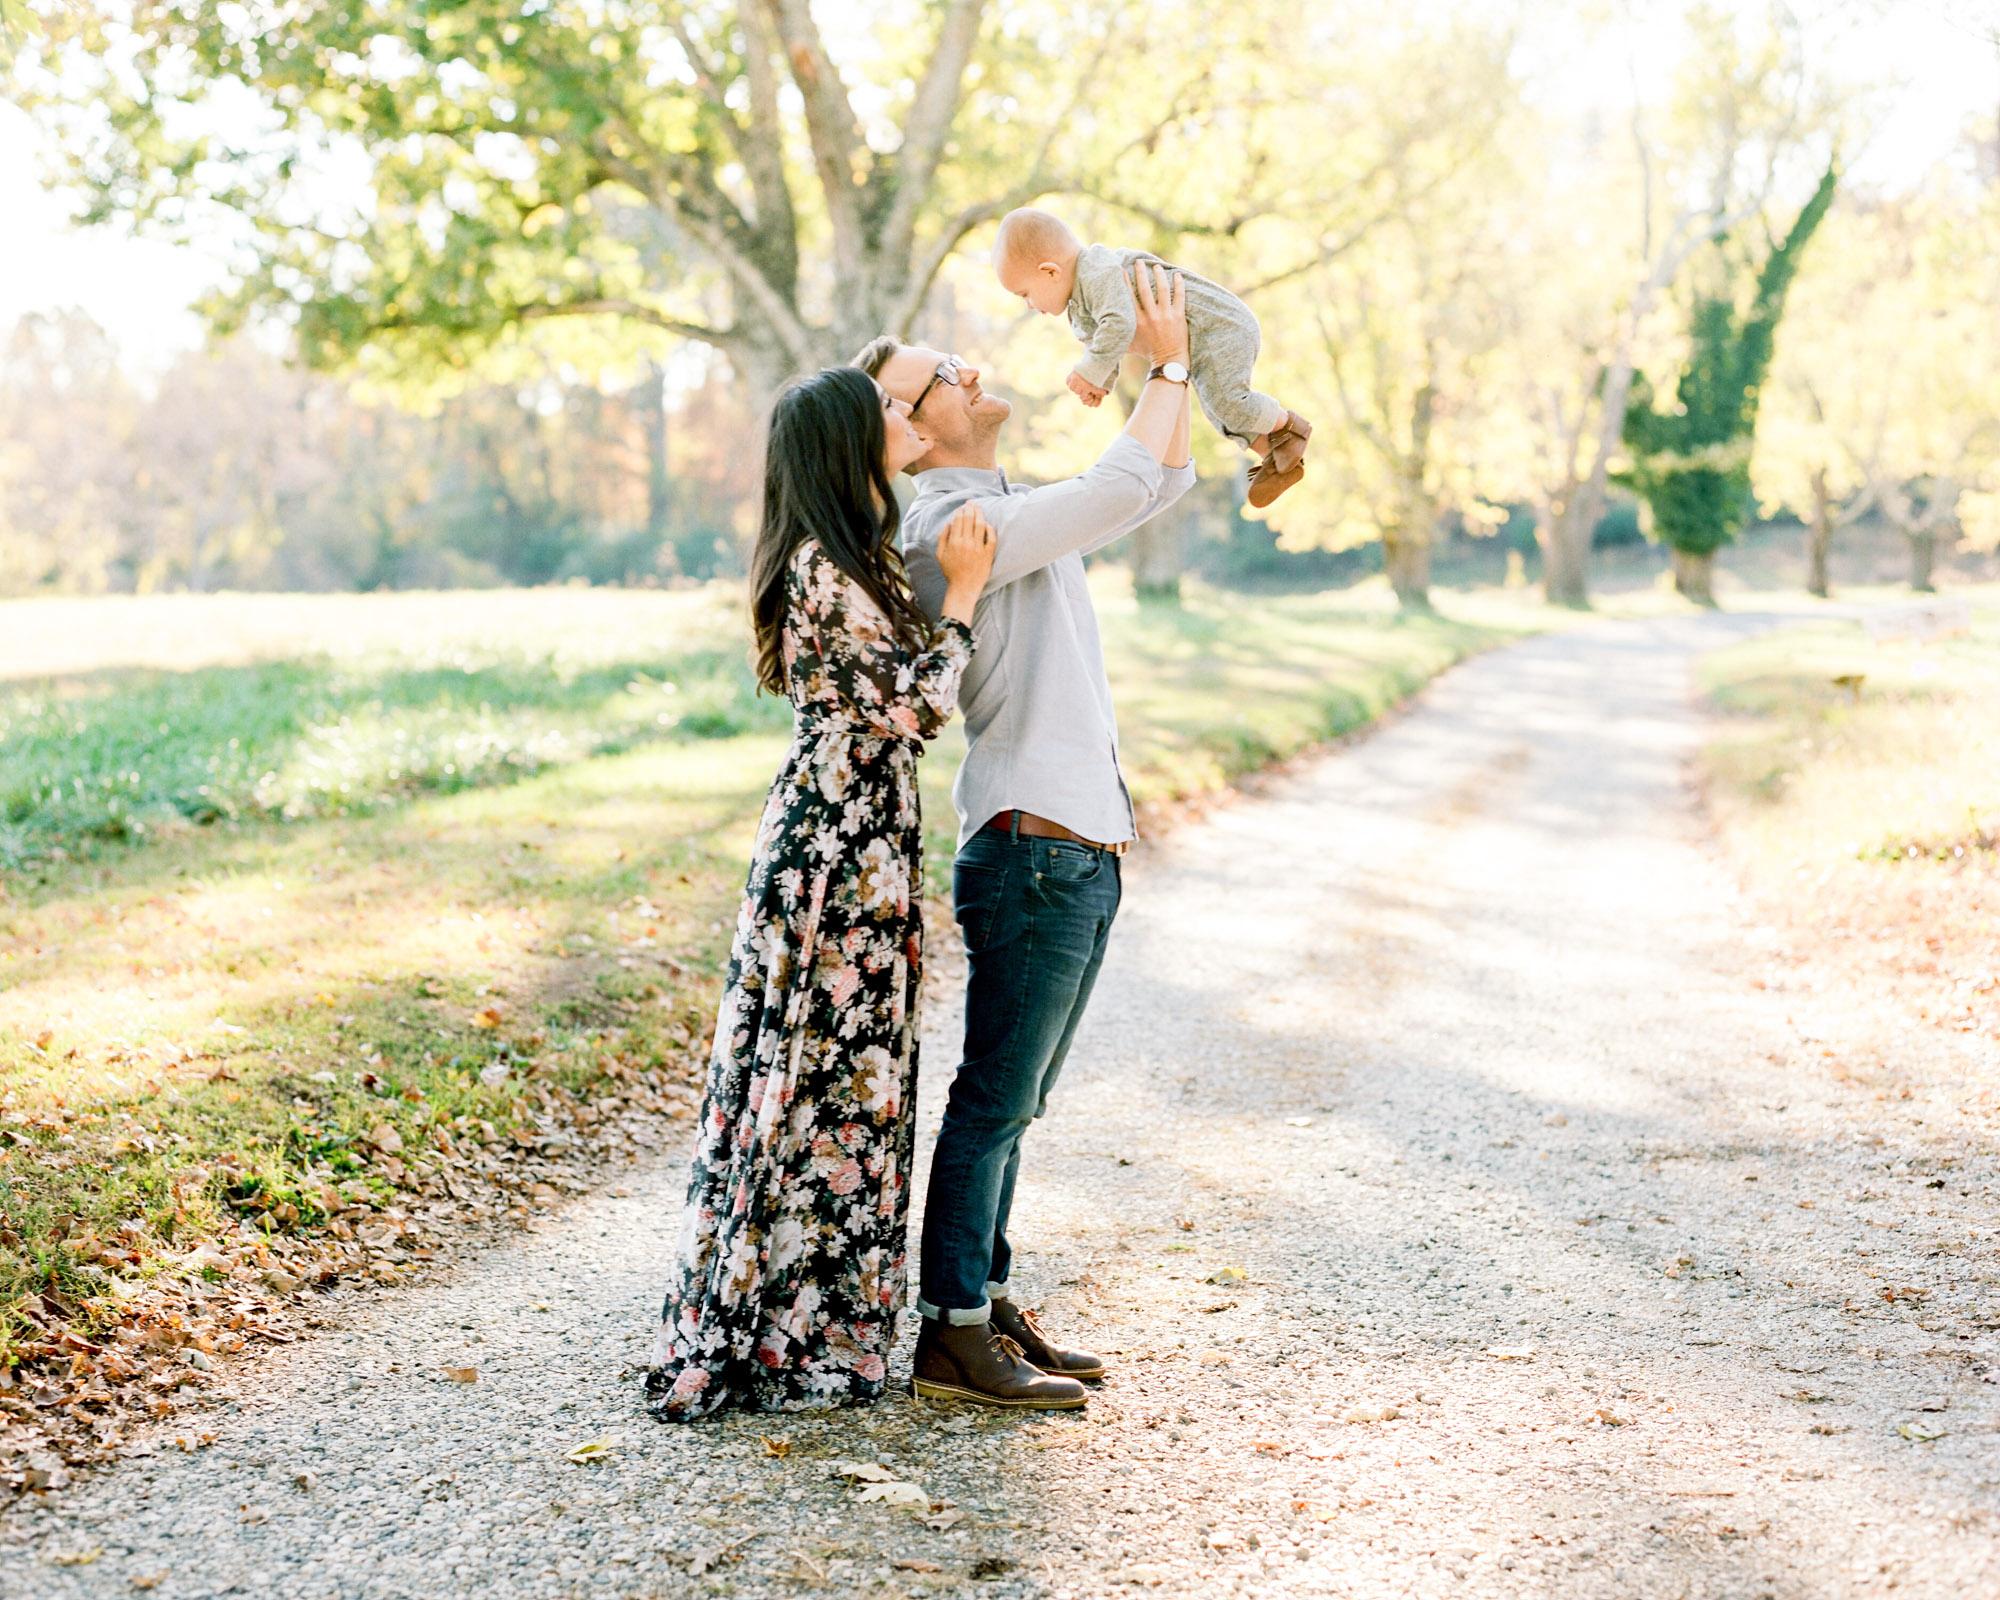 Charlottesville_Charlotte_North_Carolina_Richmond_Virginia_Family_Wedding_Film_Photographer-39.jpg